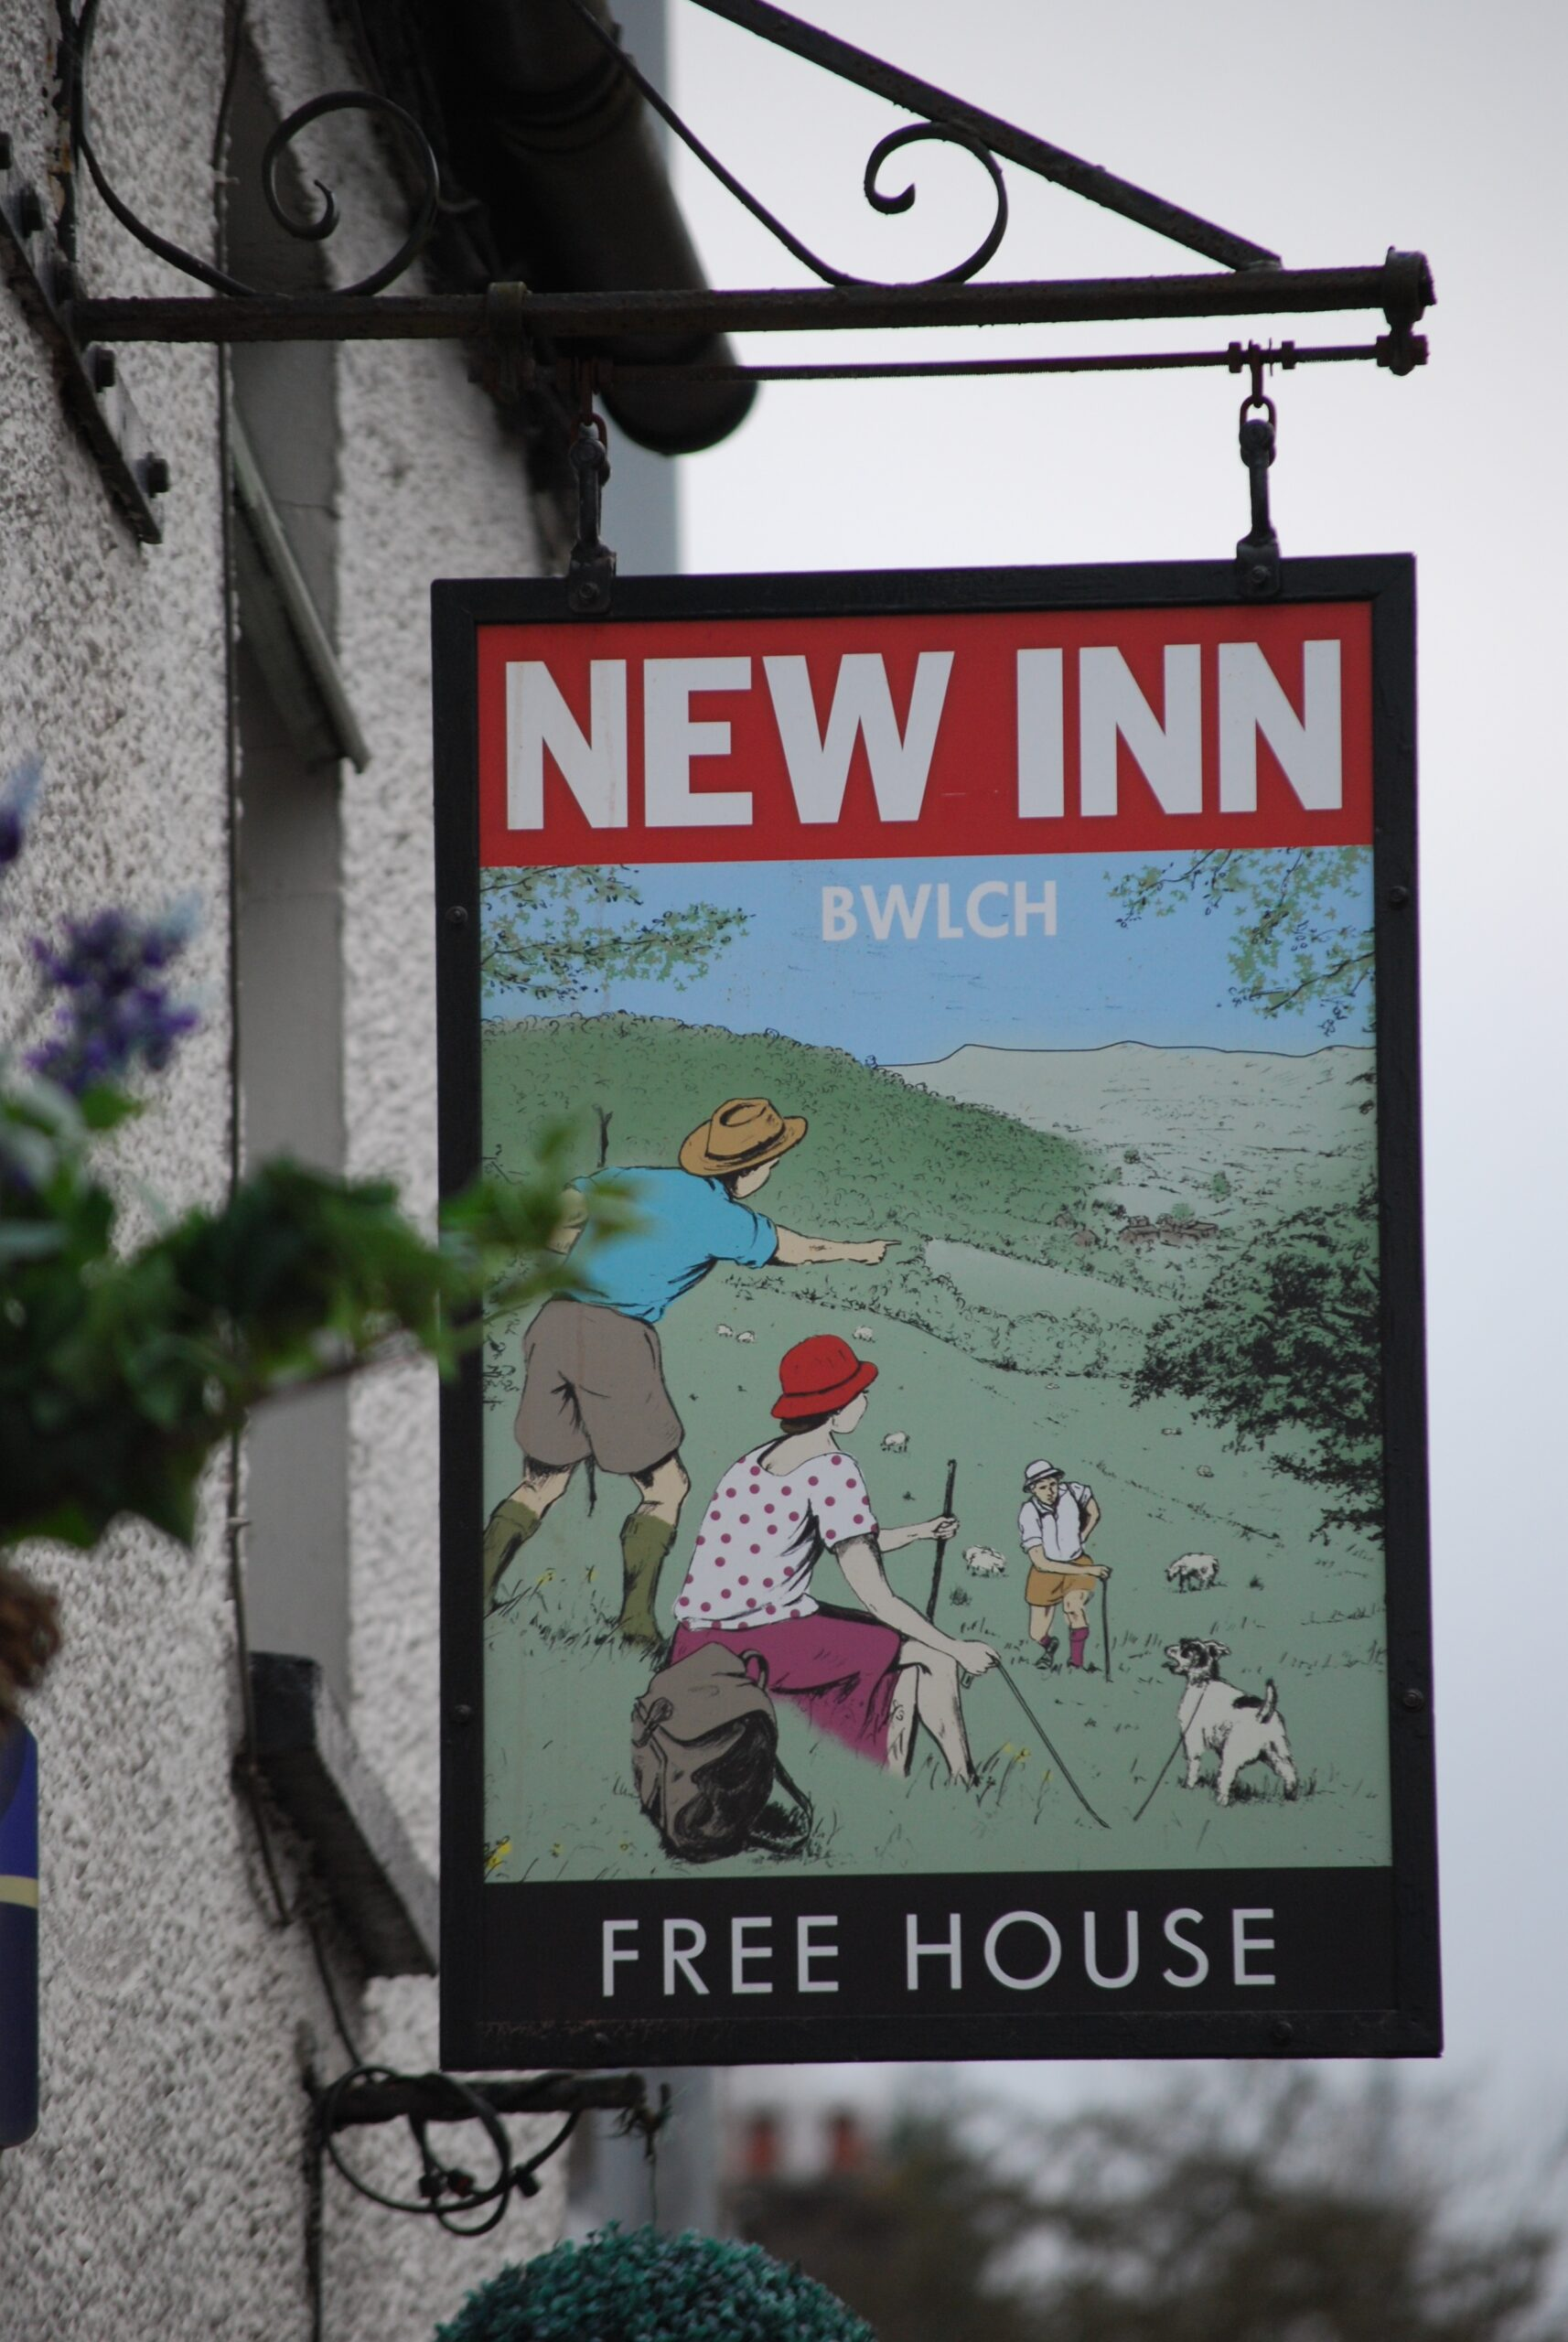 Brecon Beacons New Inn